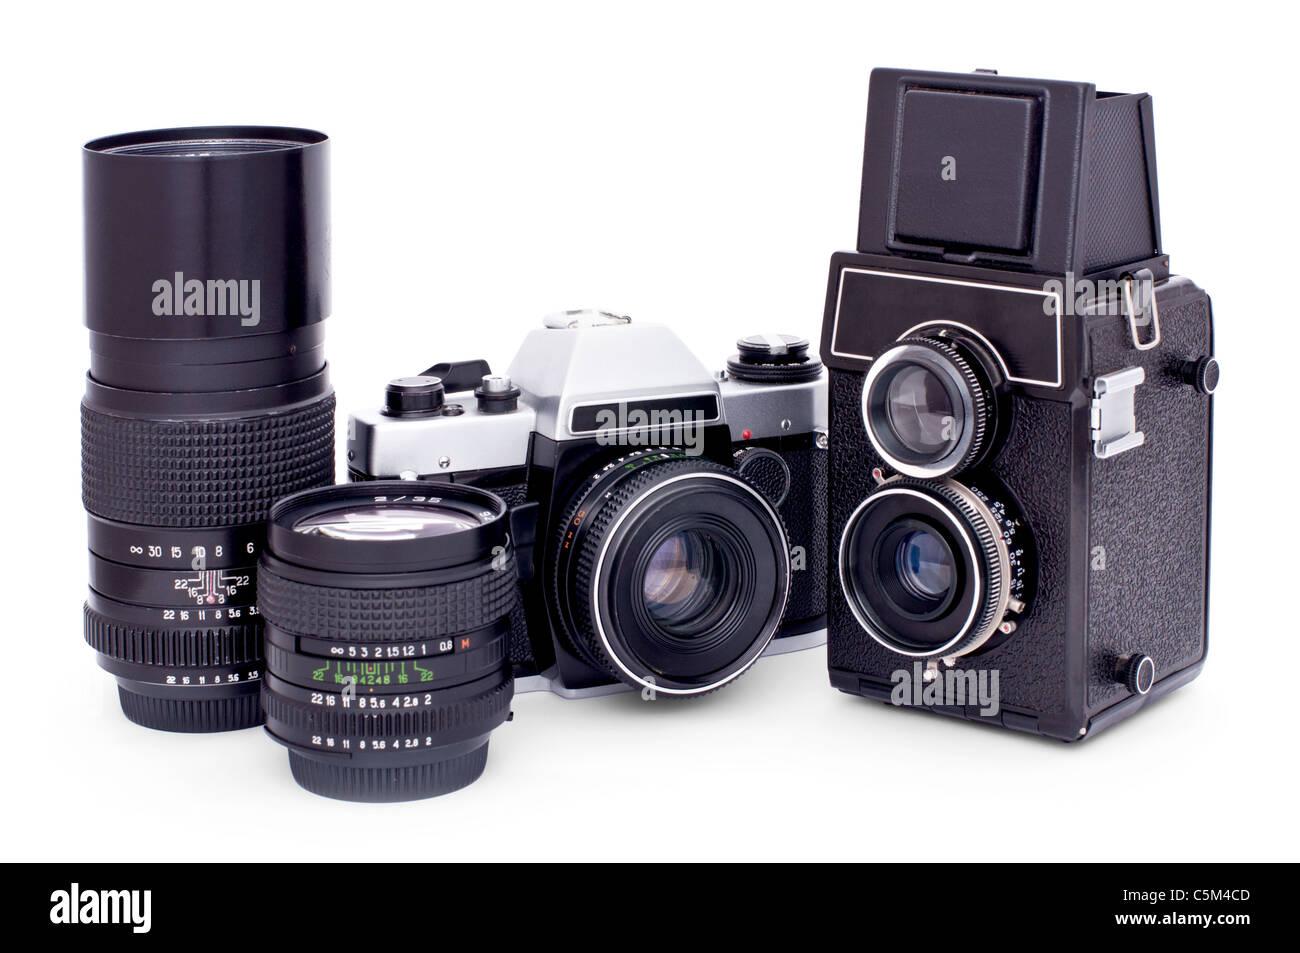 Soviet retro photo cameras and lenses isolated on white background - Stock Image